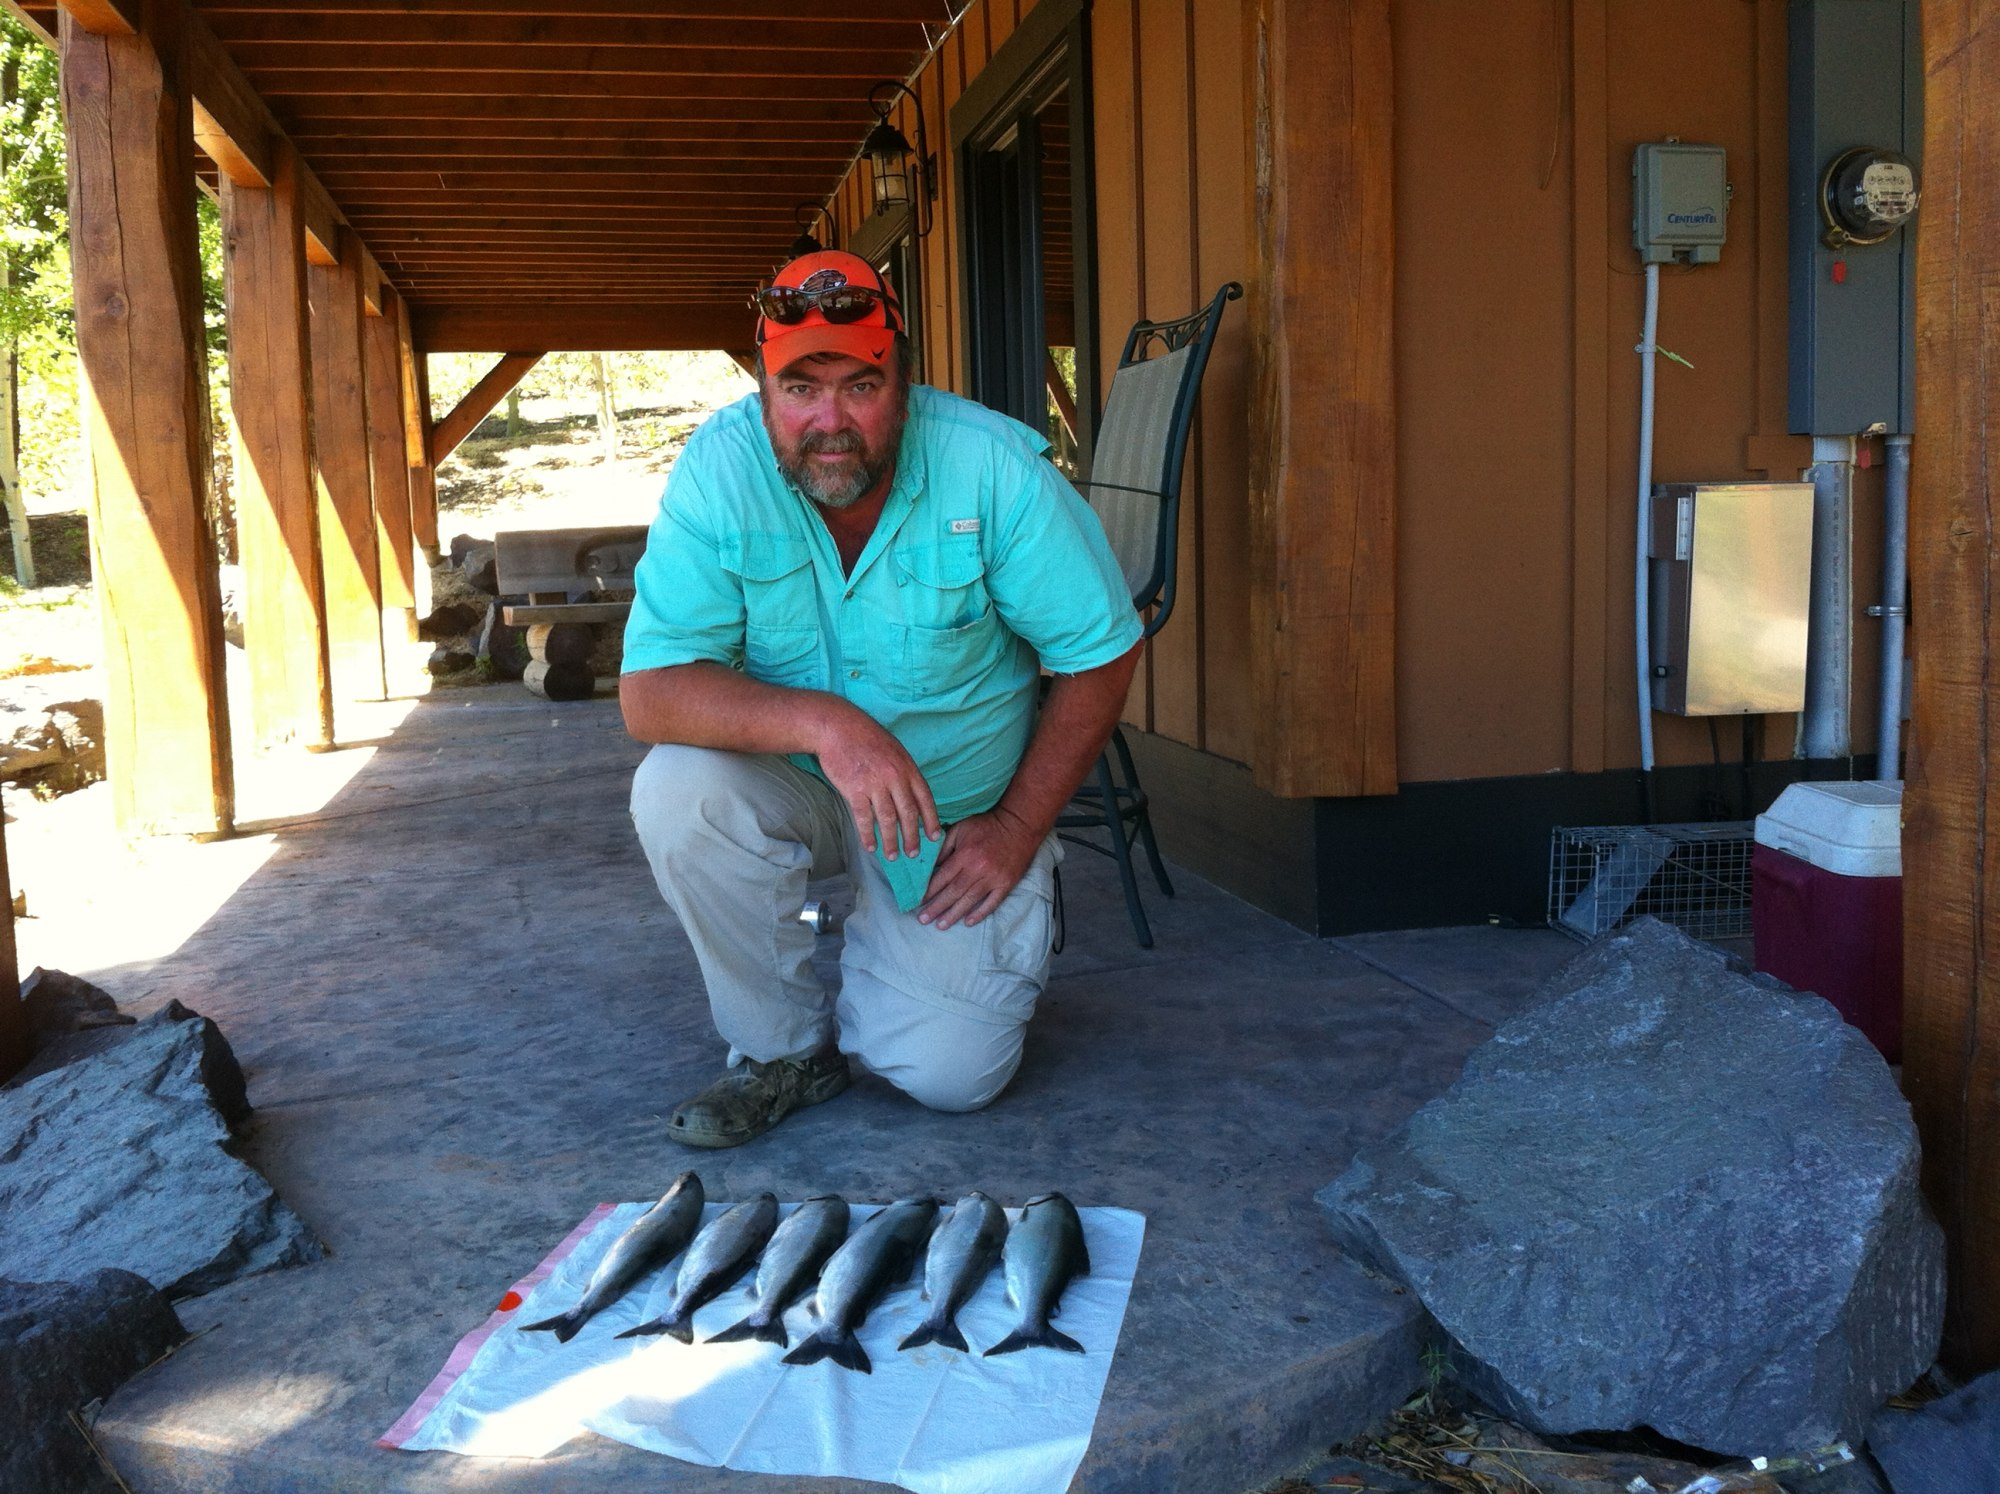 Angler Brad Halleck Fish of the Week June 20, 2013